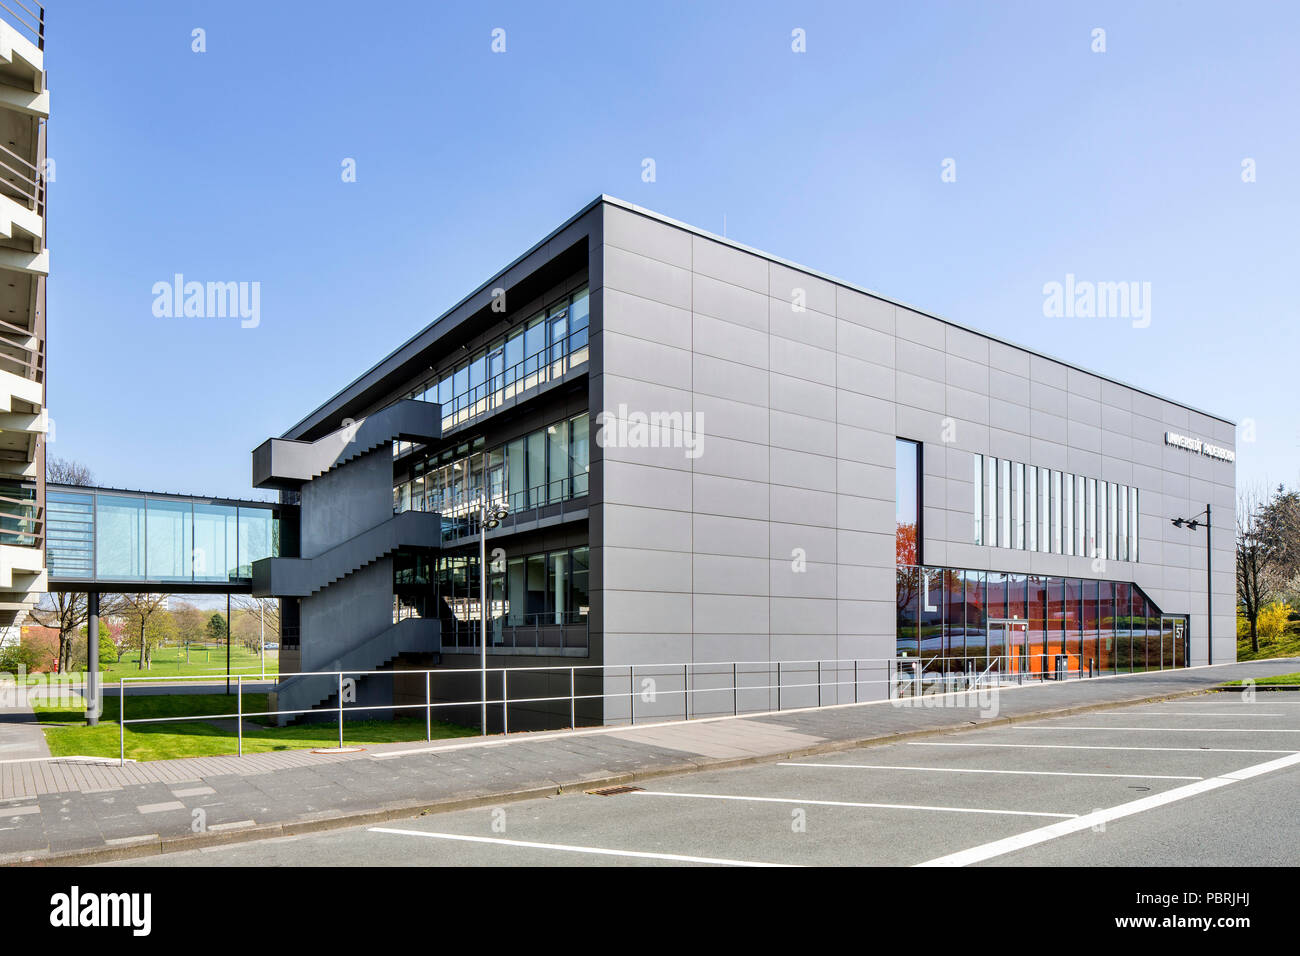 University of Paderborn, main campus, auditorium and seminar building, Paderborn, East-Westphalia, North Rhine-Westphalia - Stock Image